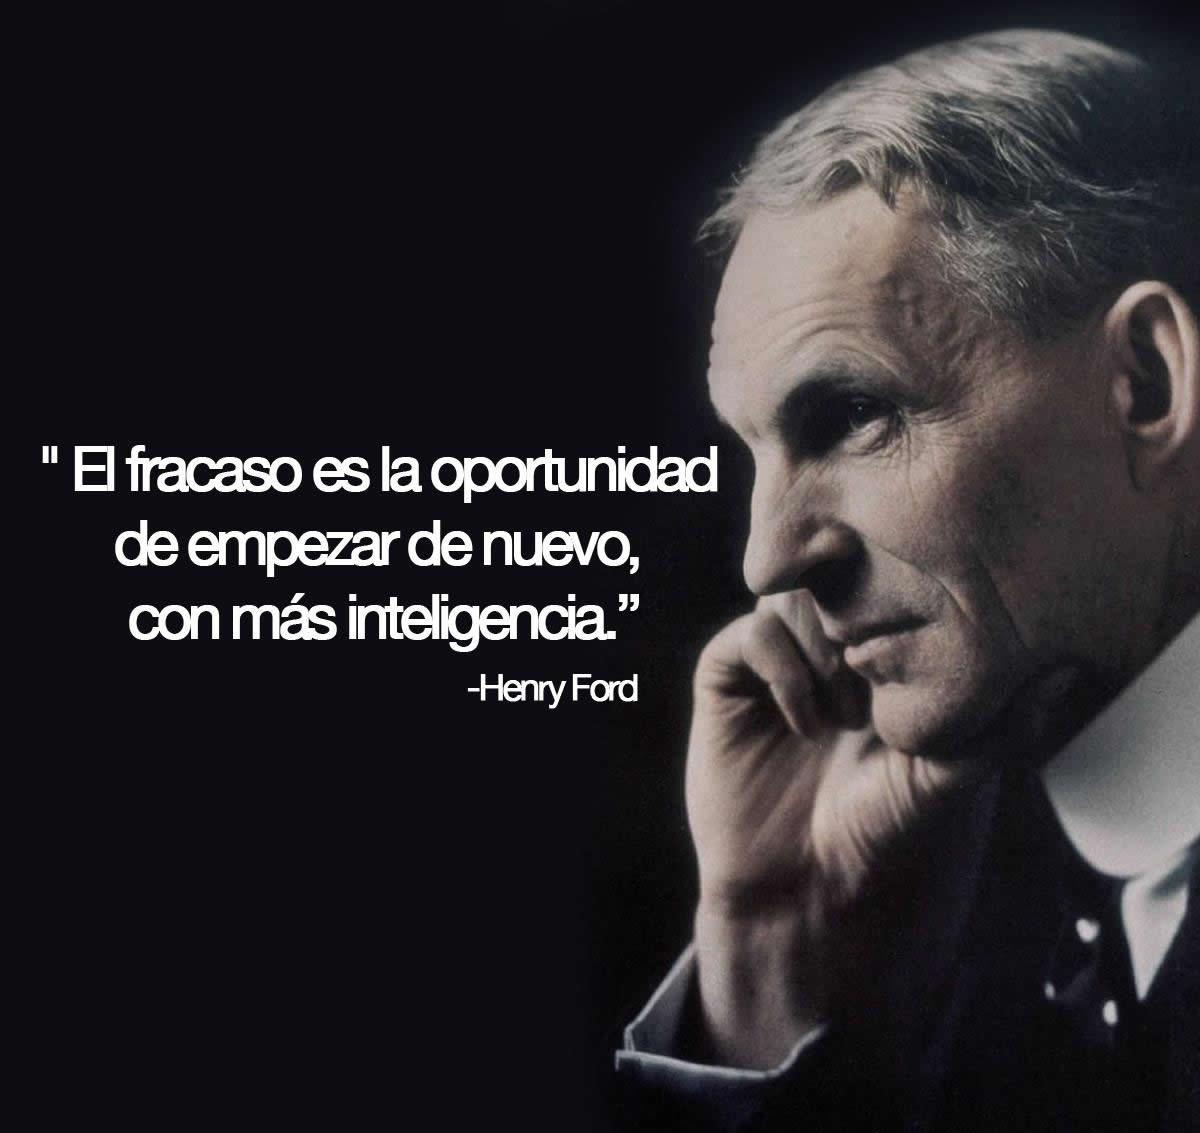 Description Henry Ford cph.3b34530.jpg